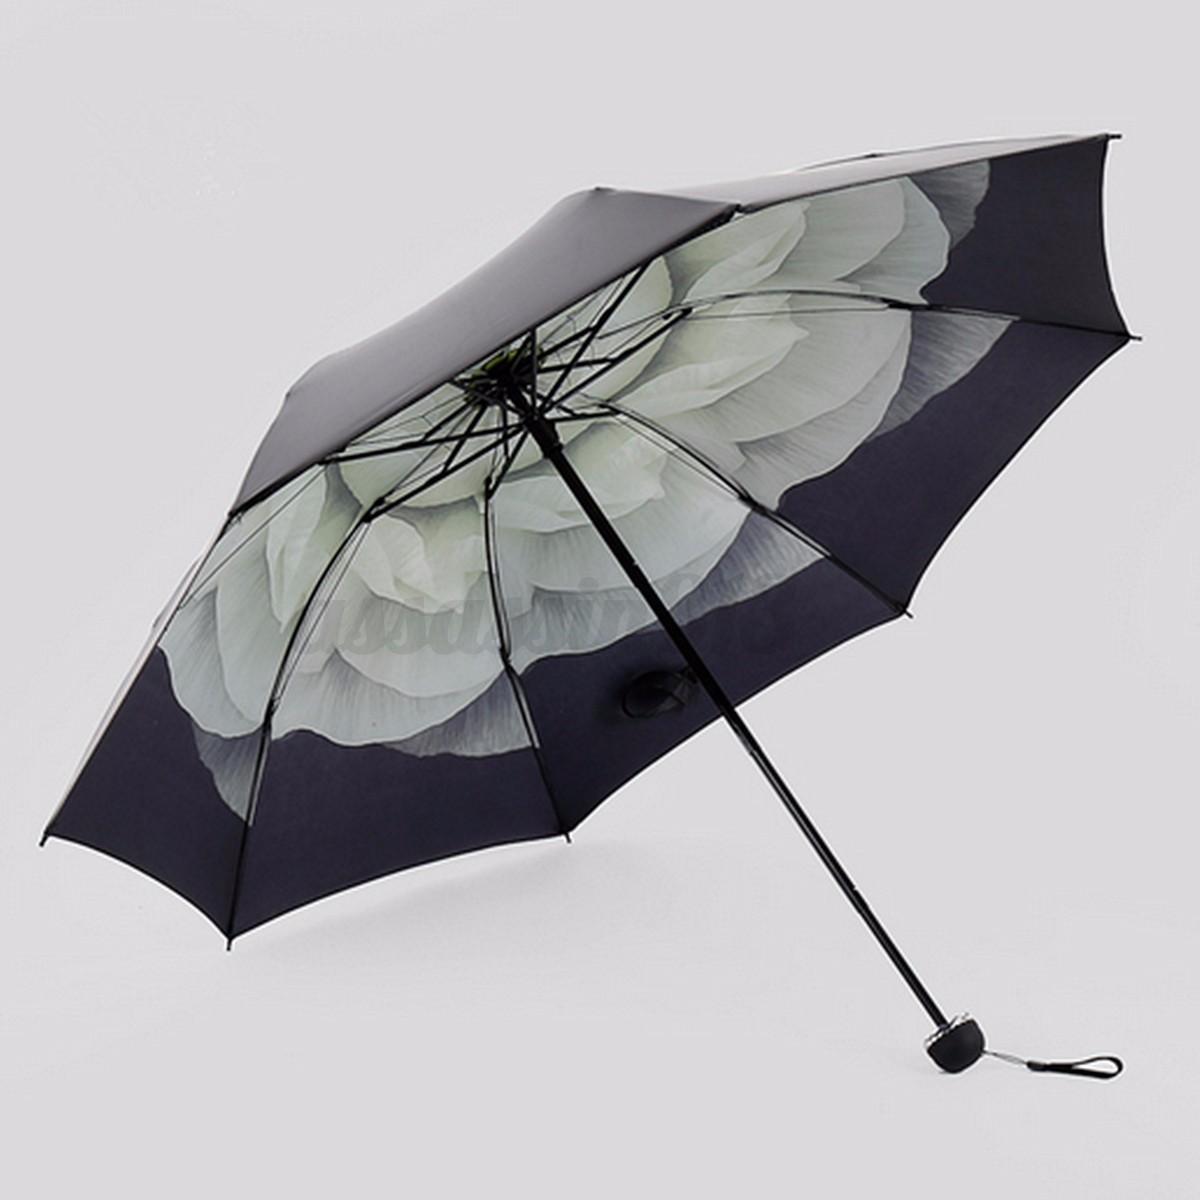 Folding Umbrella Compact Windproof Anti Uv Rain Sun